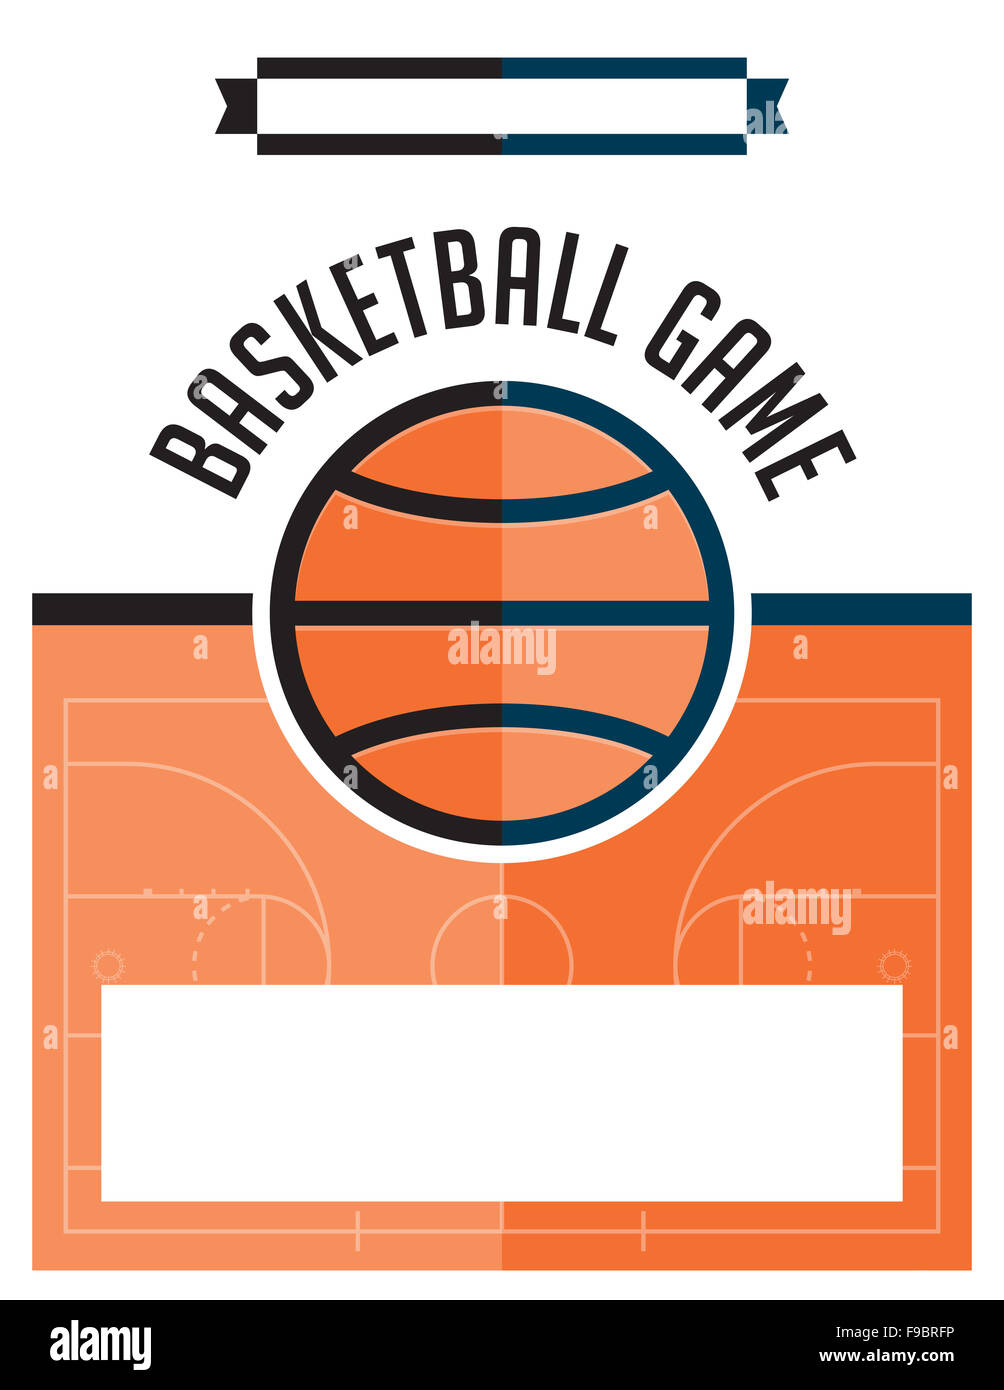 Basketball Poster Background Stockfotos & Basketball Poster ...